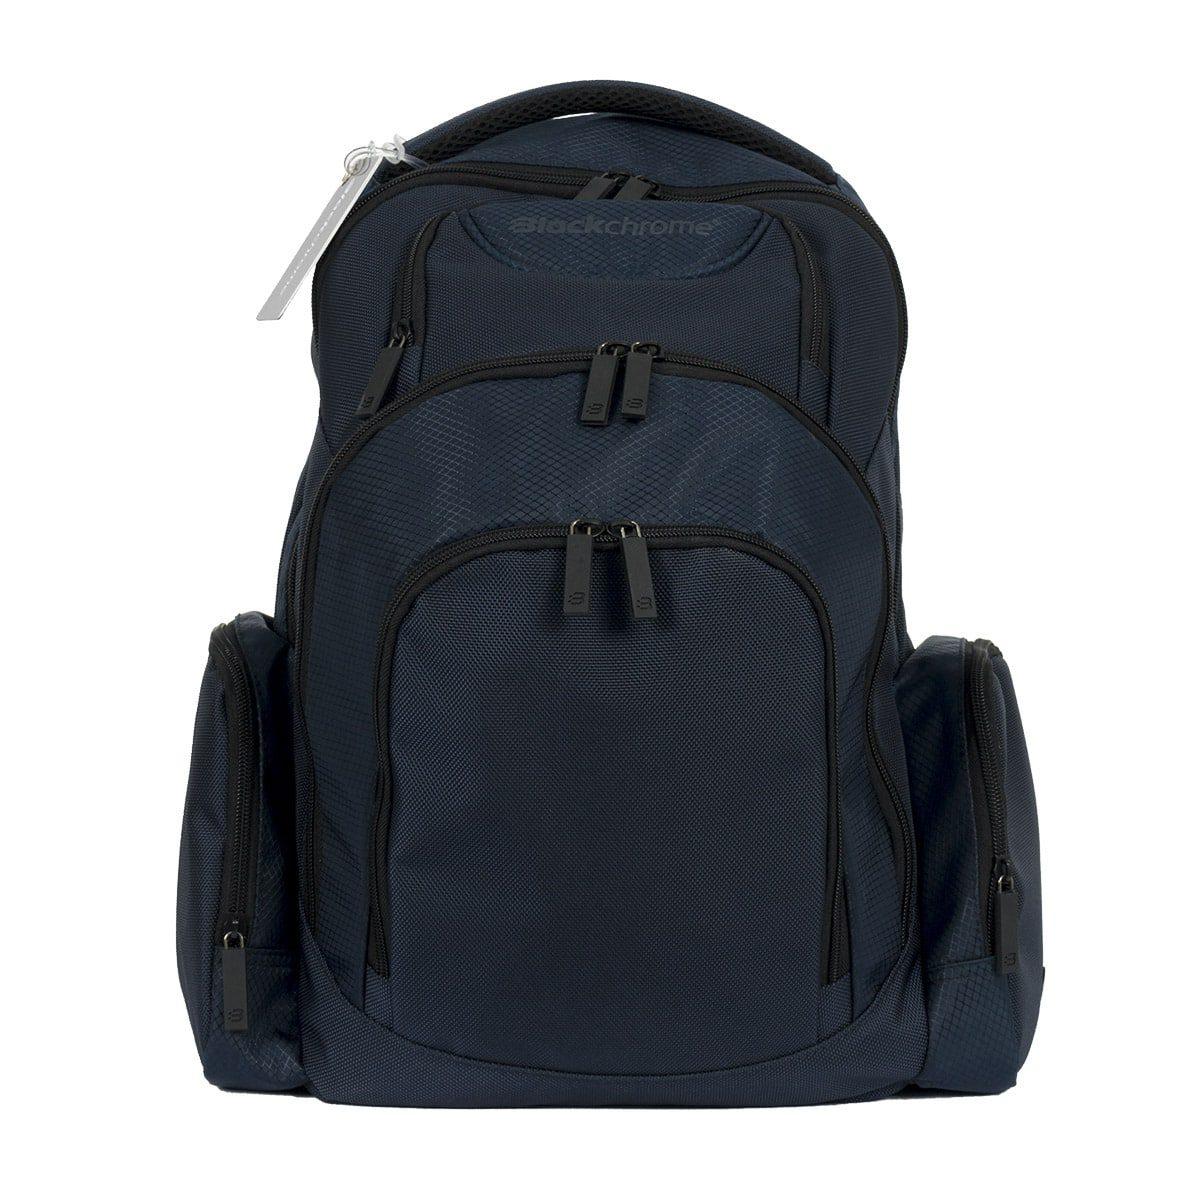 734fbbc6b373 Customised Bags - Blackchrome Sportswear